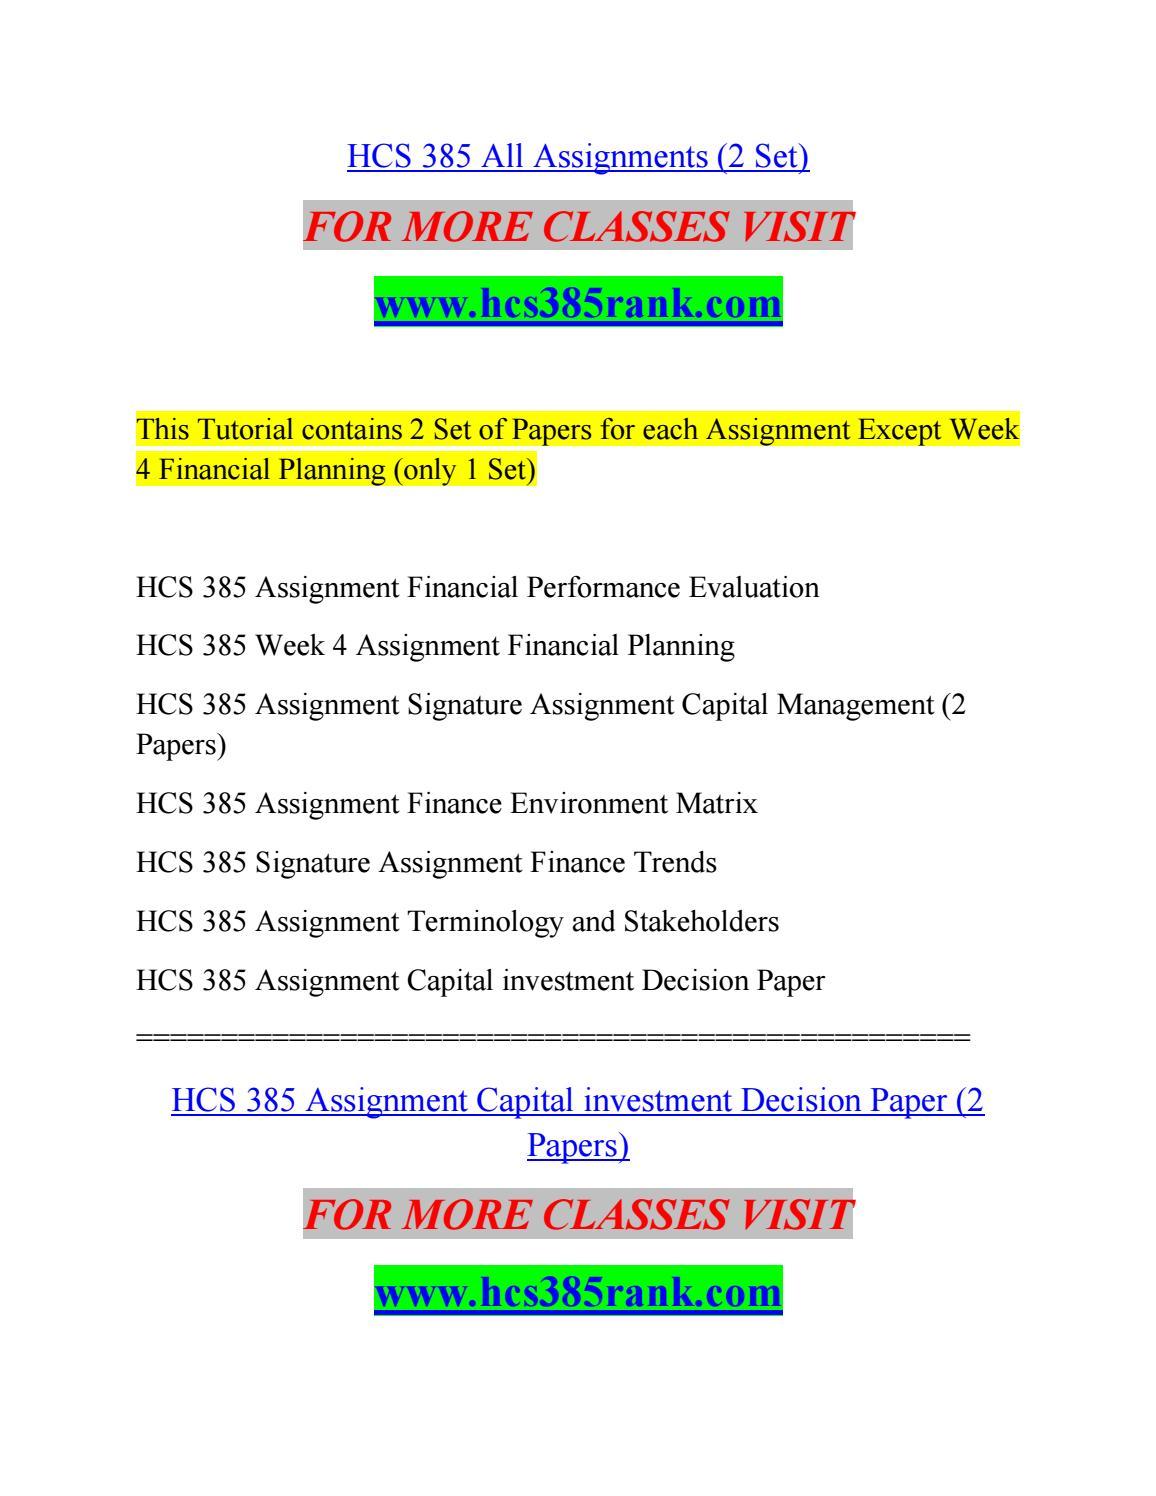 Ratio Analysis Spreadsheet Hcs 385 pertaining to Hcs 385 All Assignments 2 Setvmsbn  Issuu